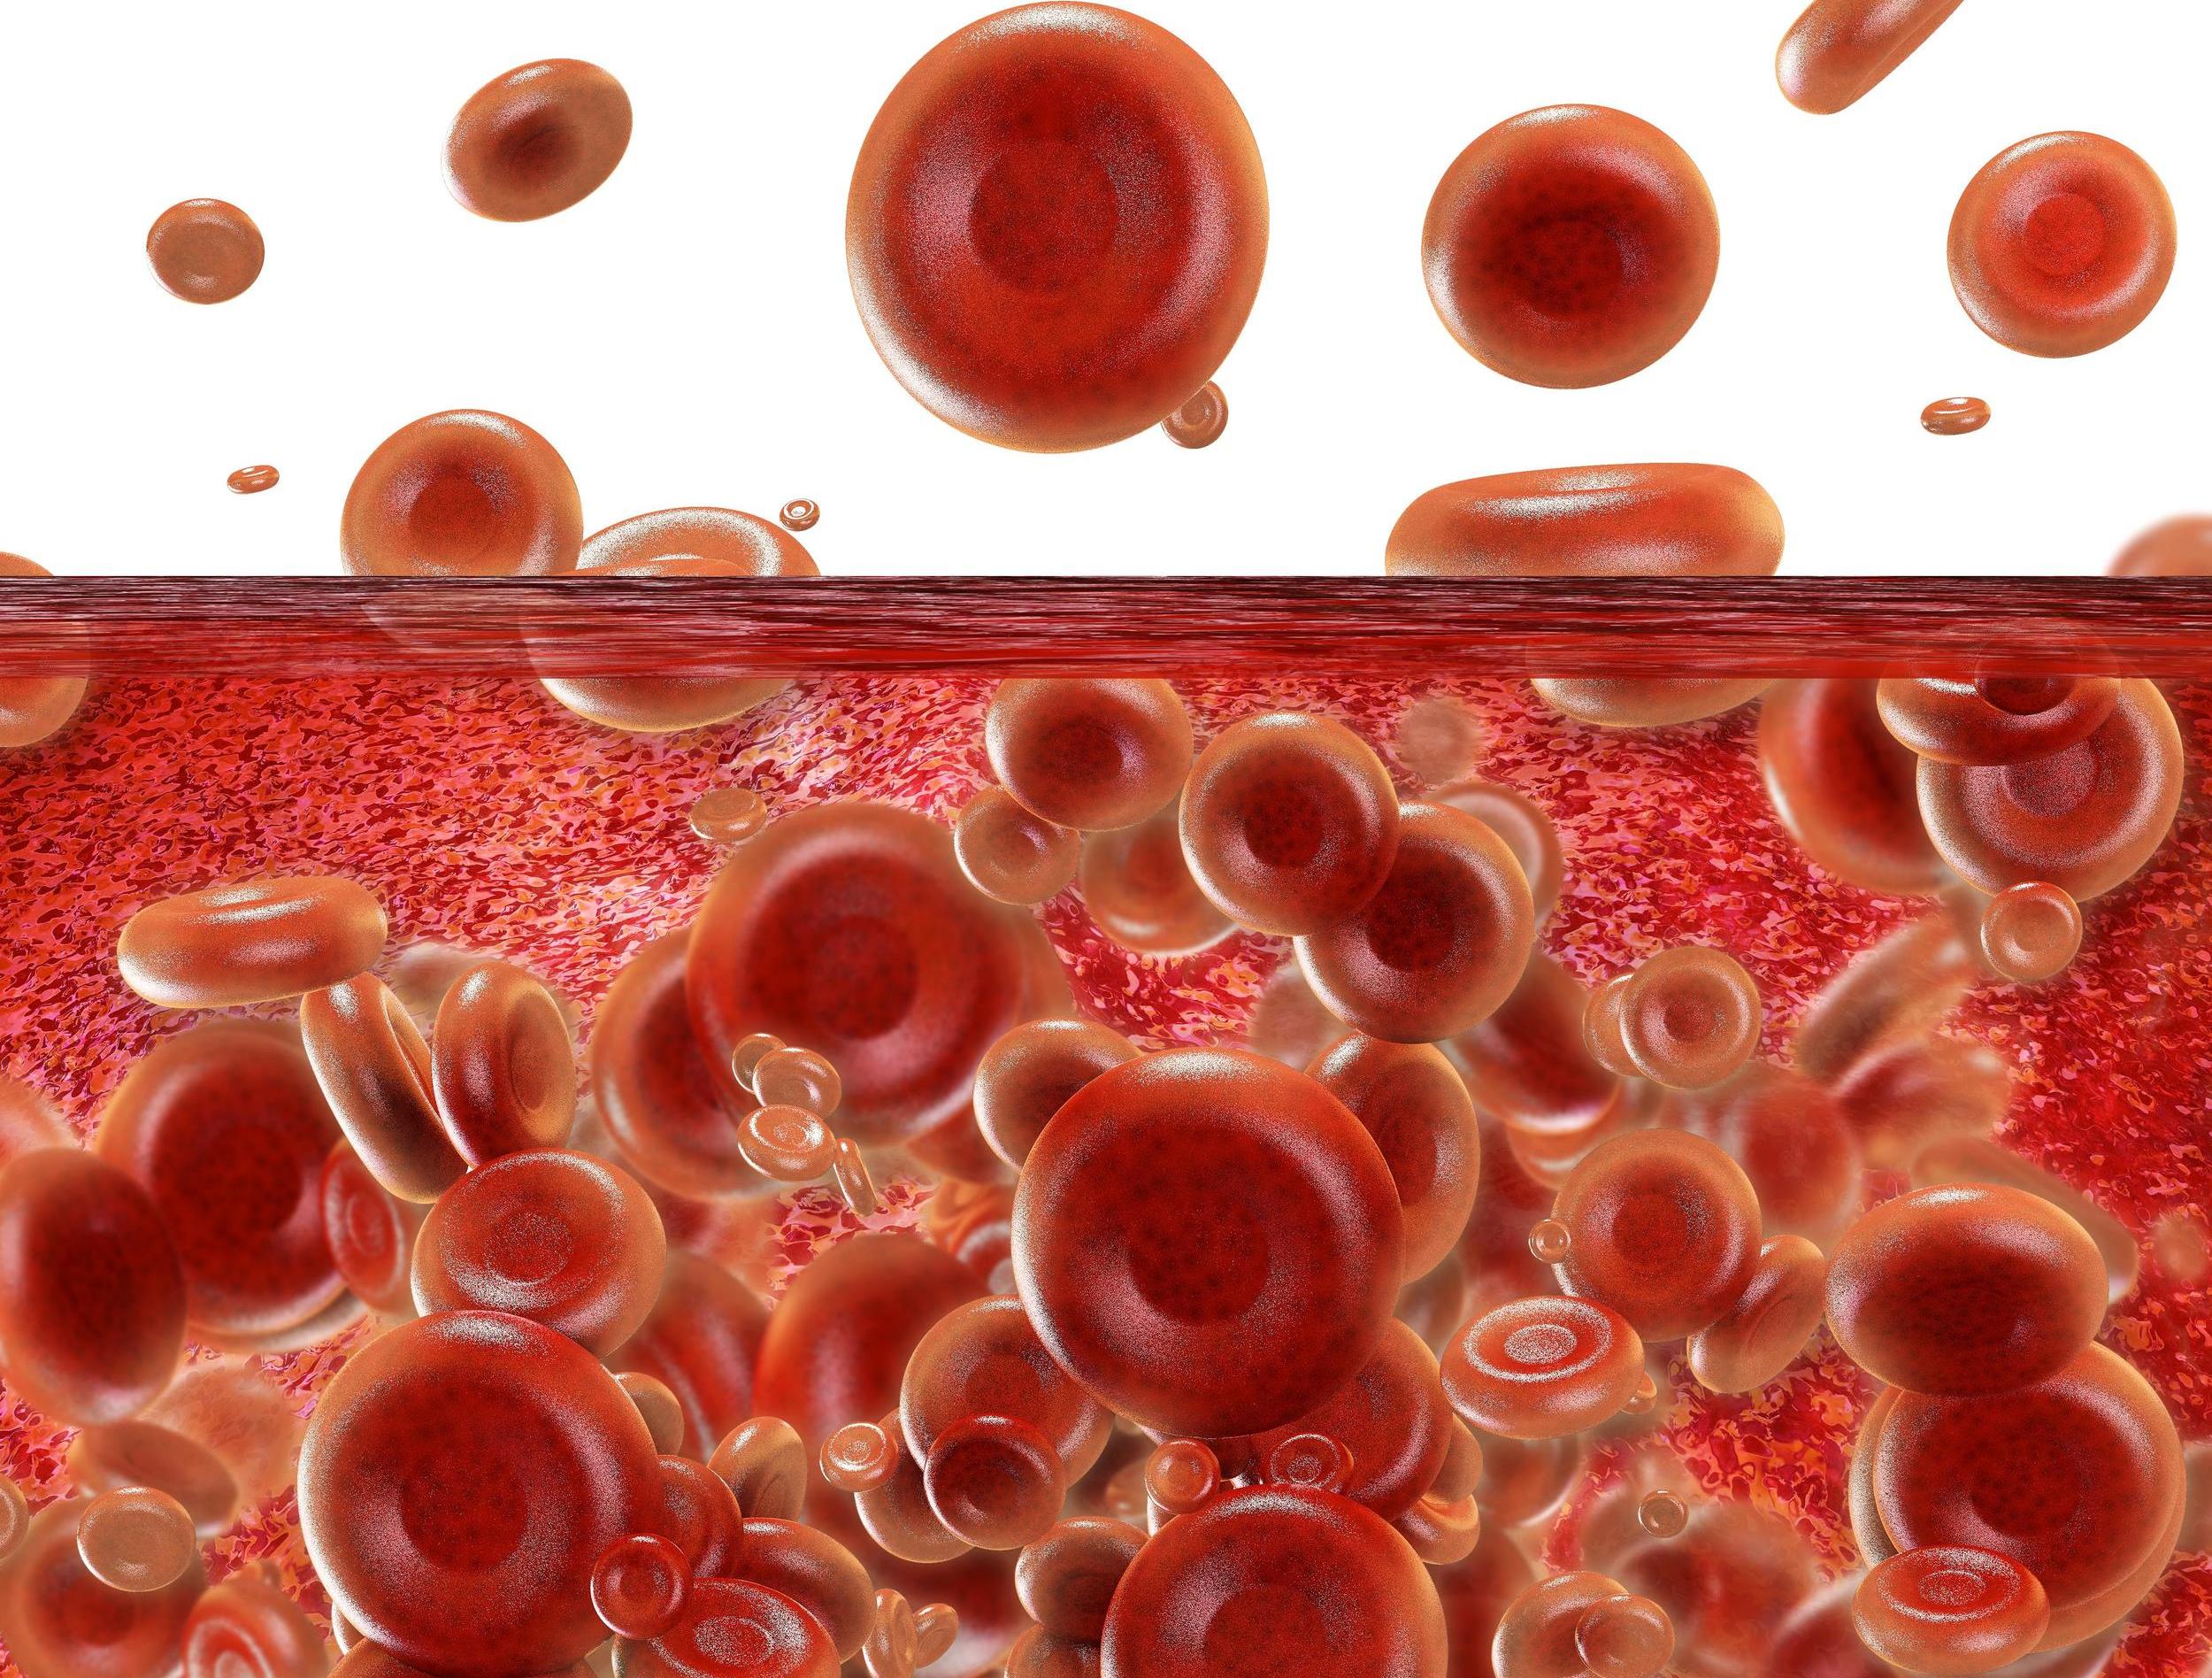 Platelet Rich Plasma Therapy - PRP